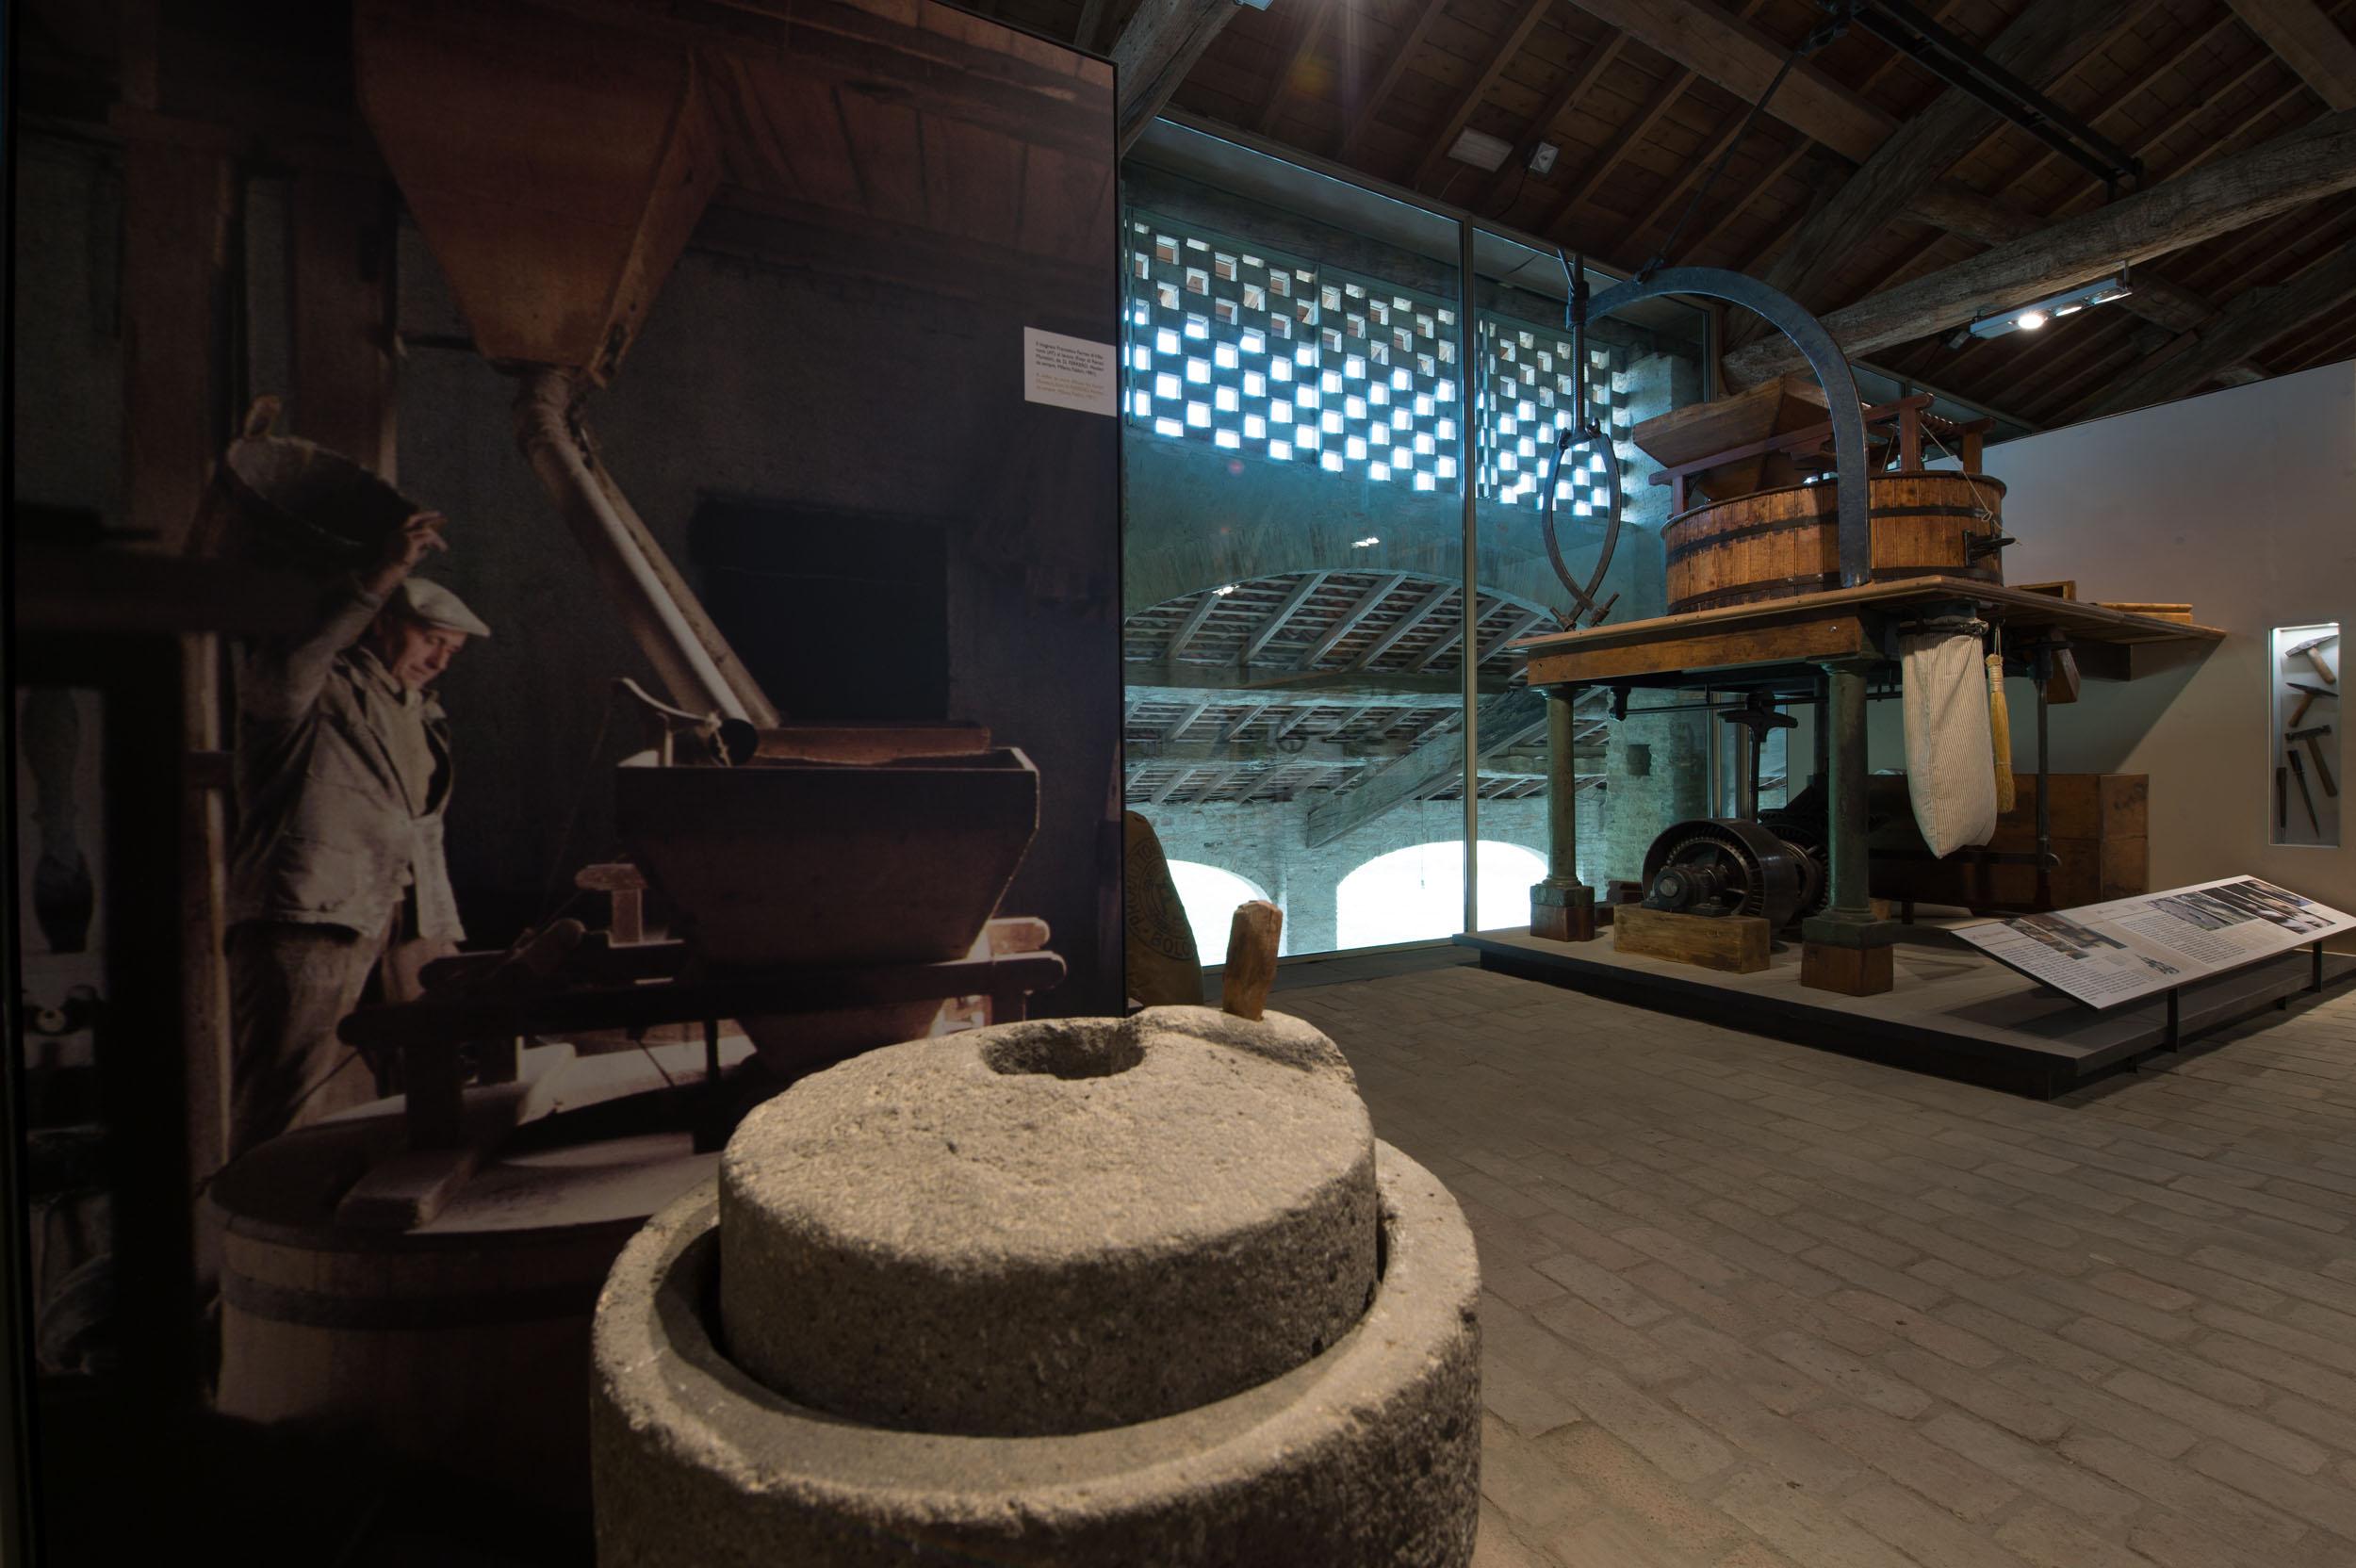 Pasta Museum in Collecchio (PR), interior n. 1 (Picture by L. Rossi)